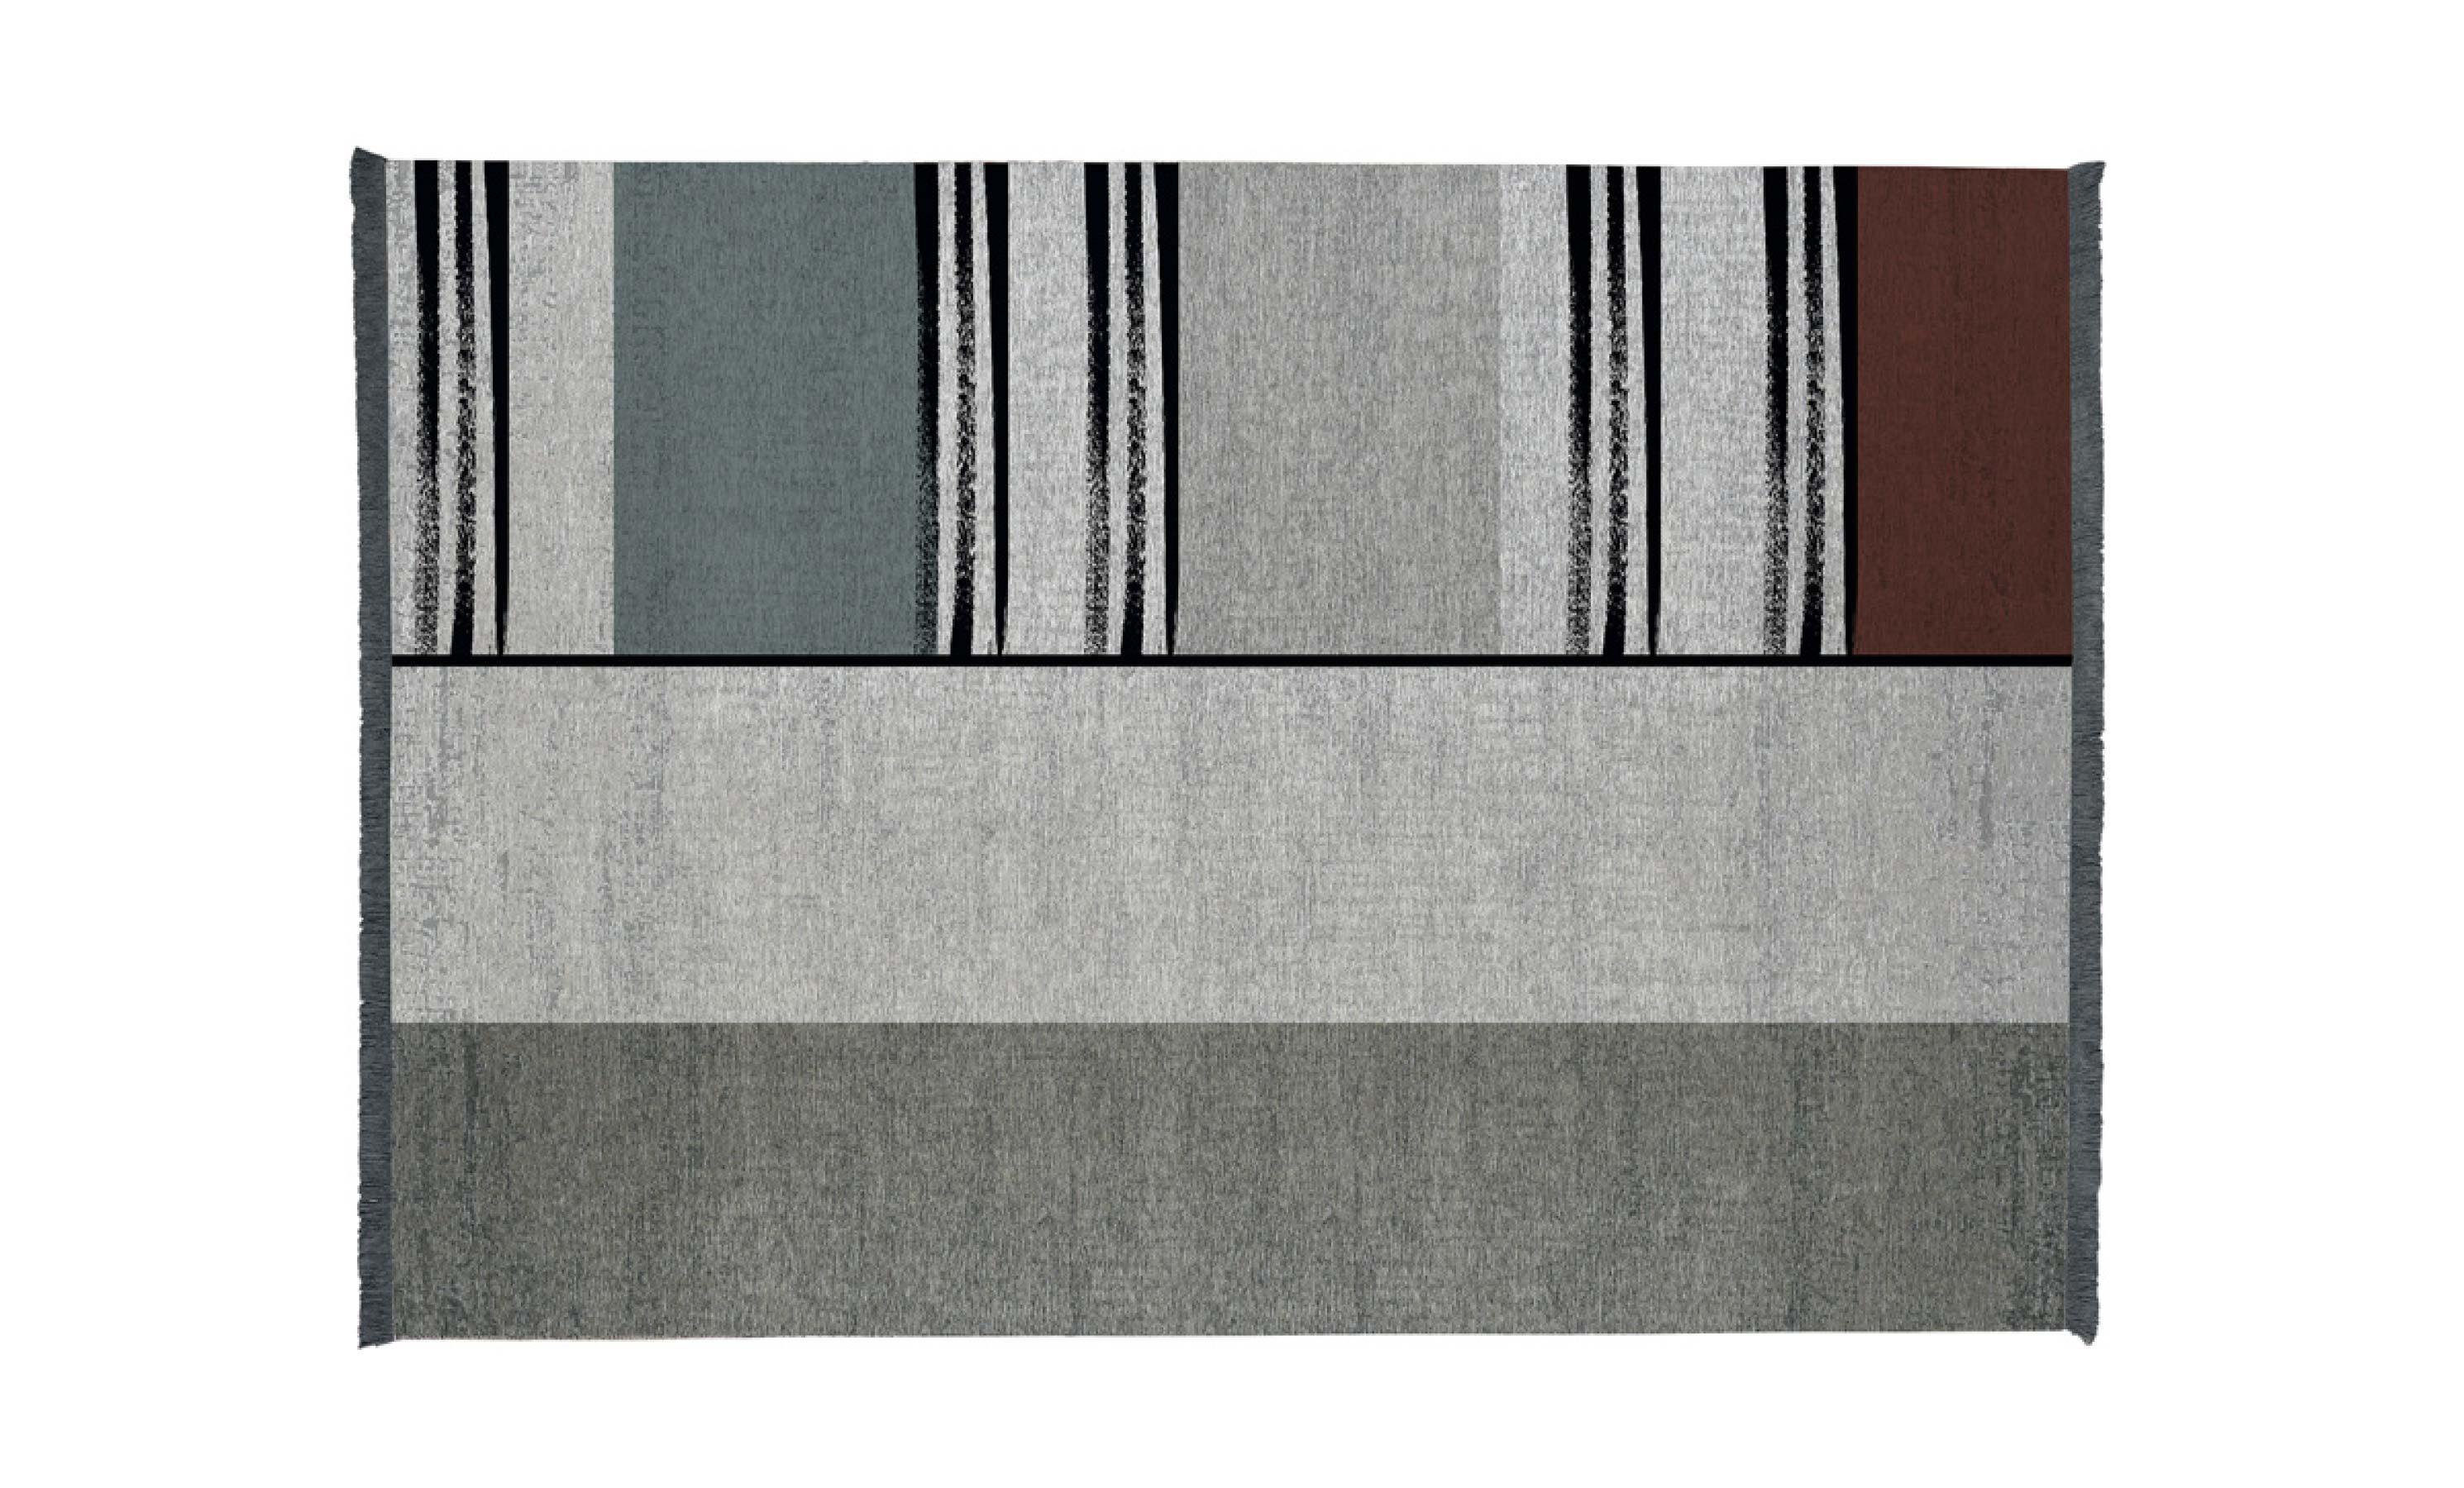 http://desidea.hu/wp-content/uploads/2019/11/tappeto-rug-stripes.jpg